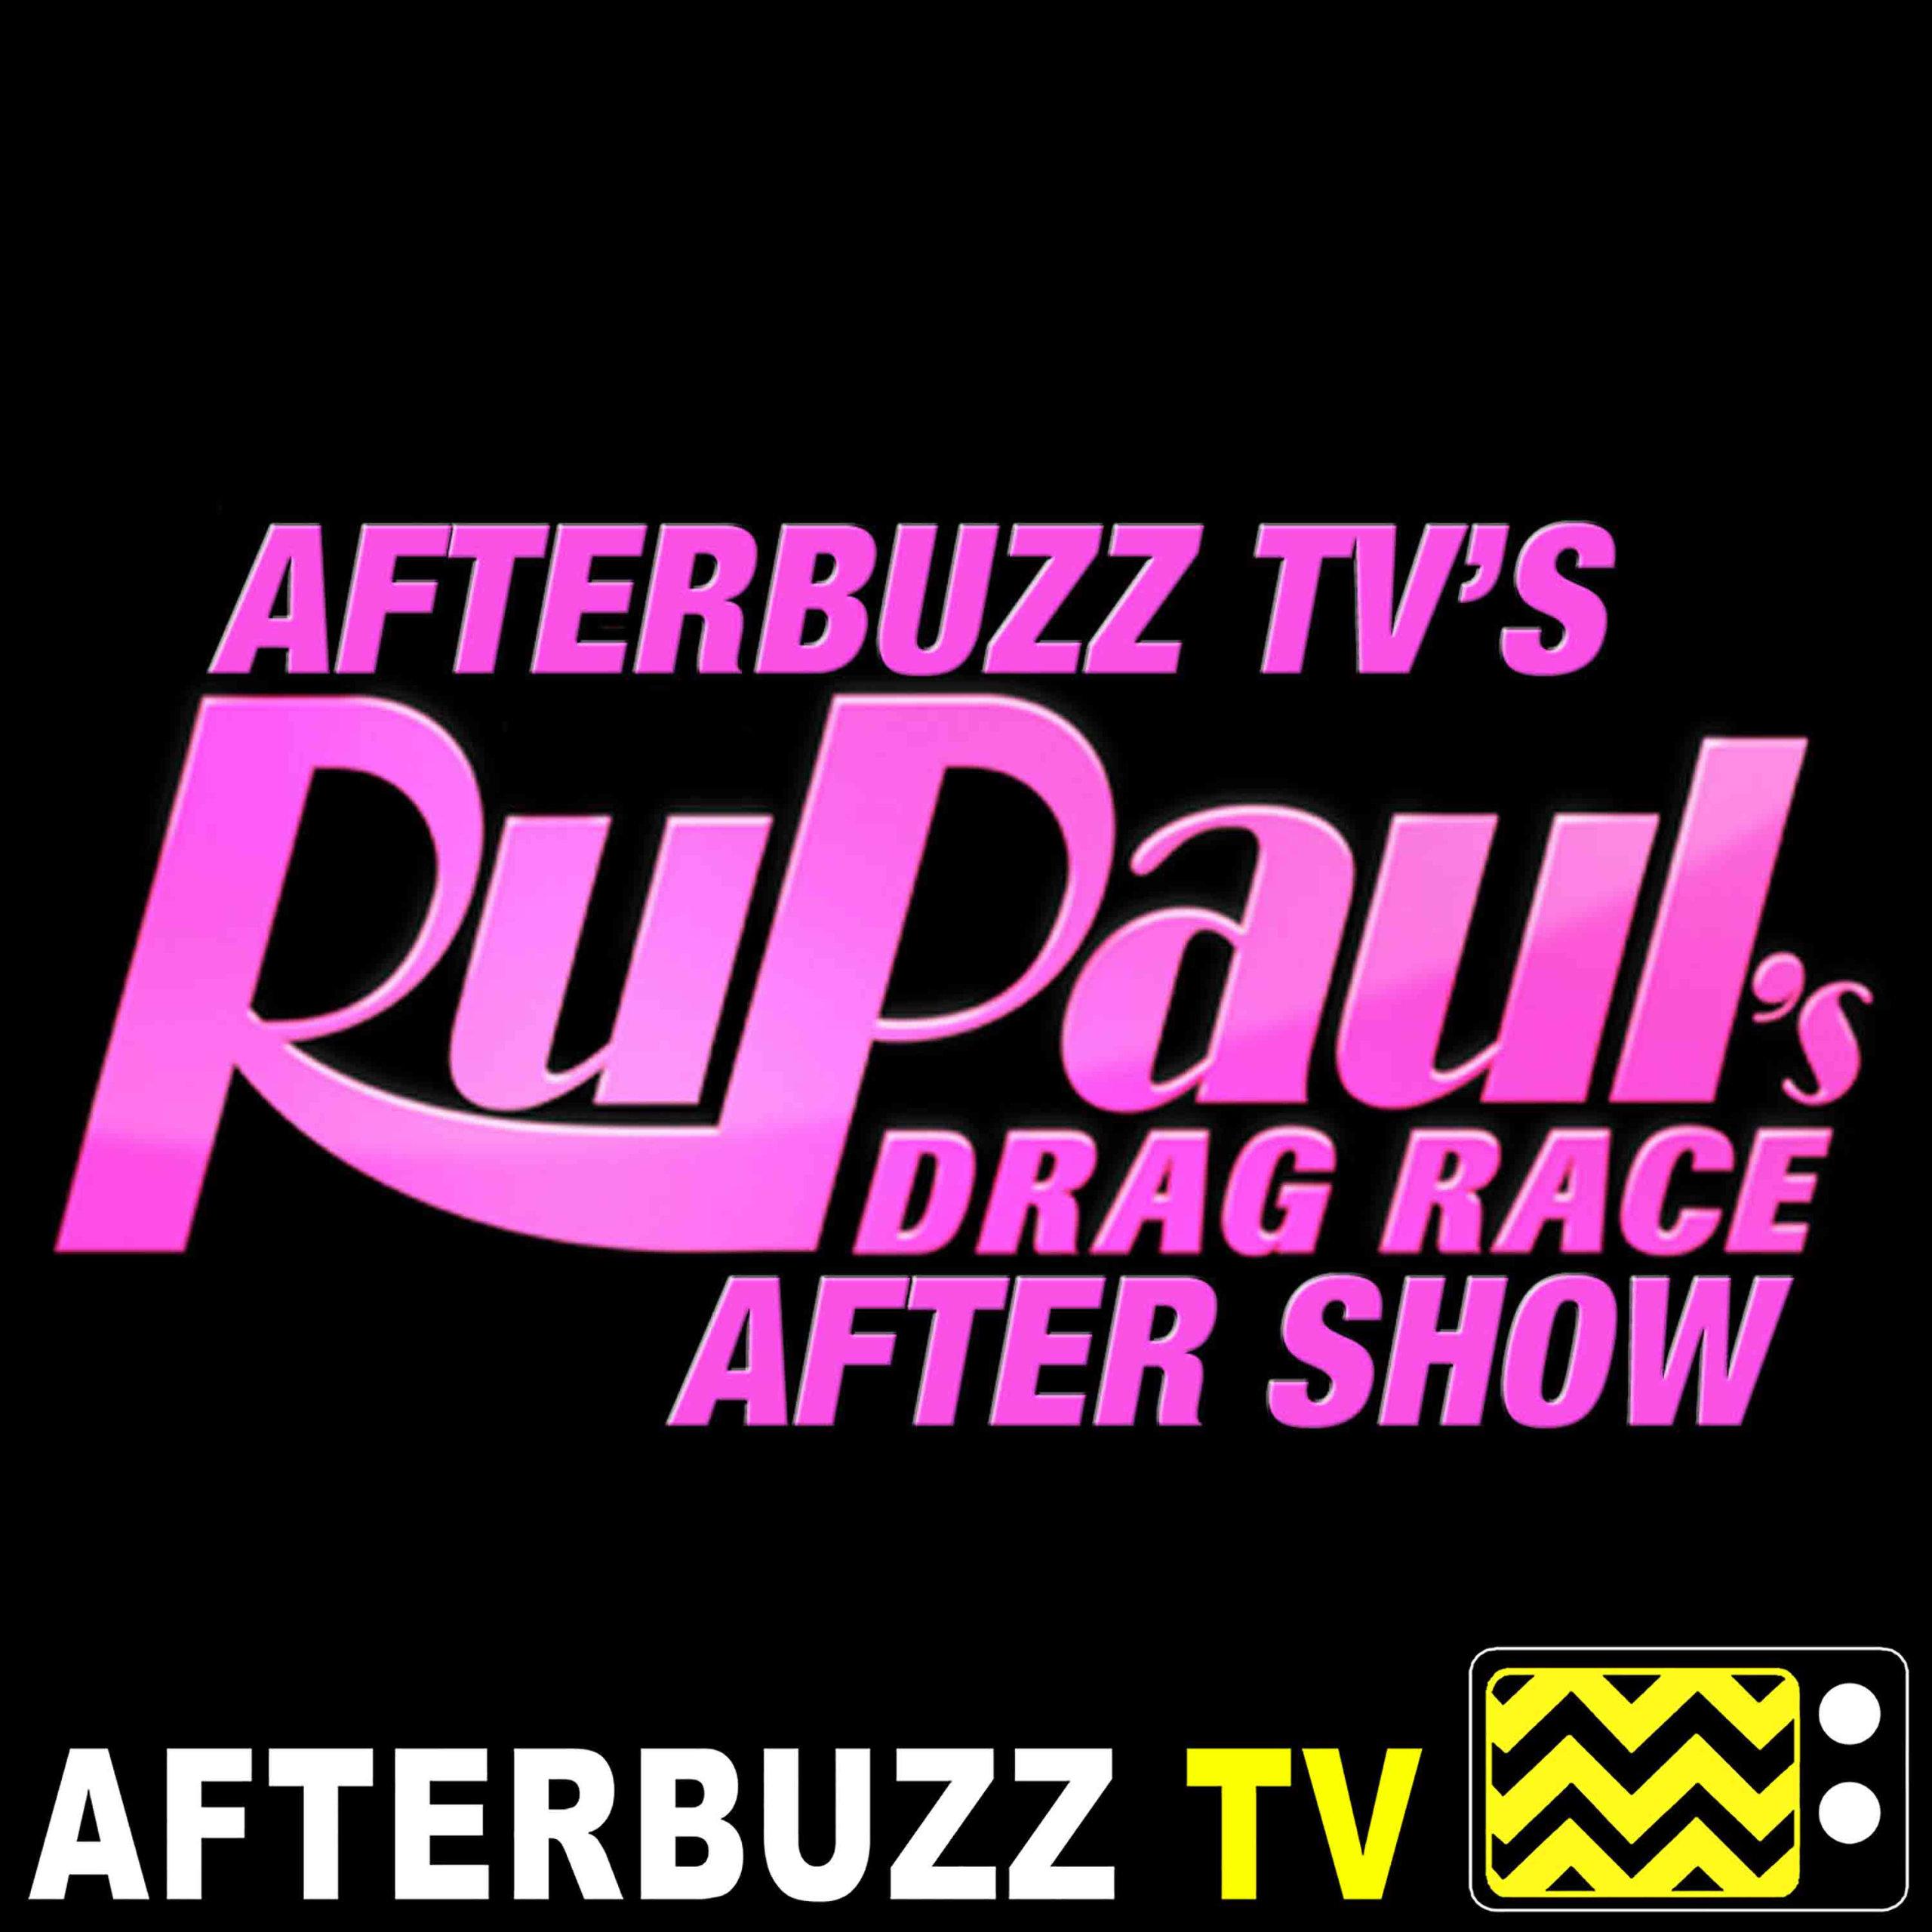 RuPaul's Drag Race S12 E13 Recap & After Show: It's a Slumber Party!